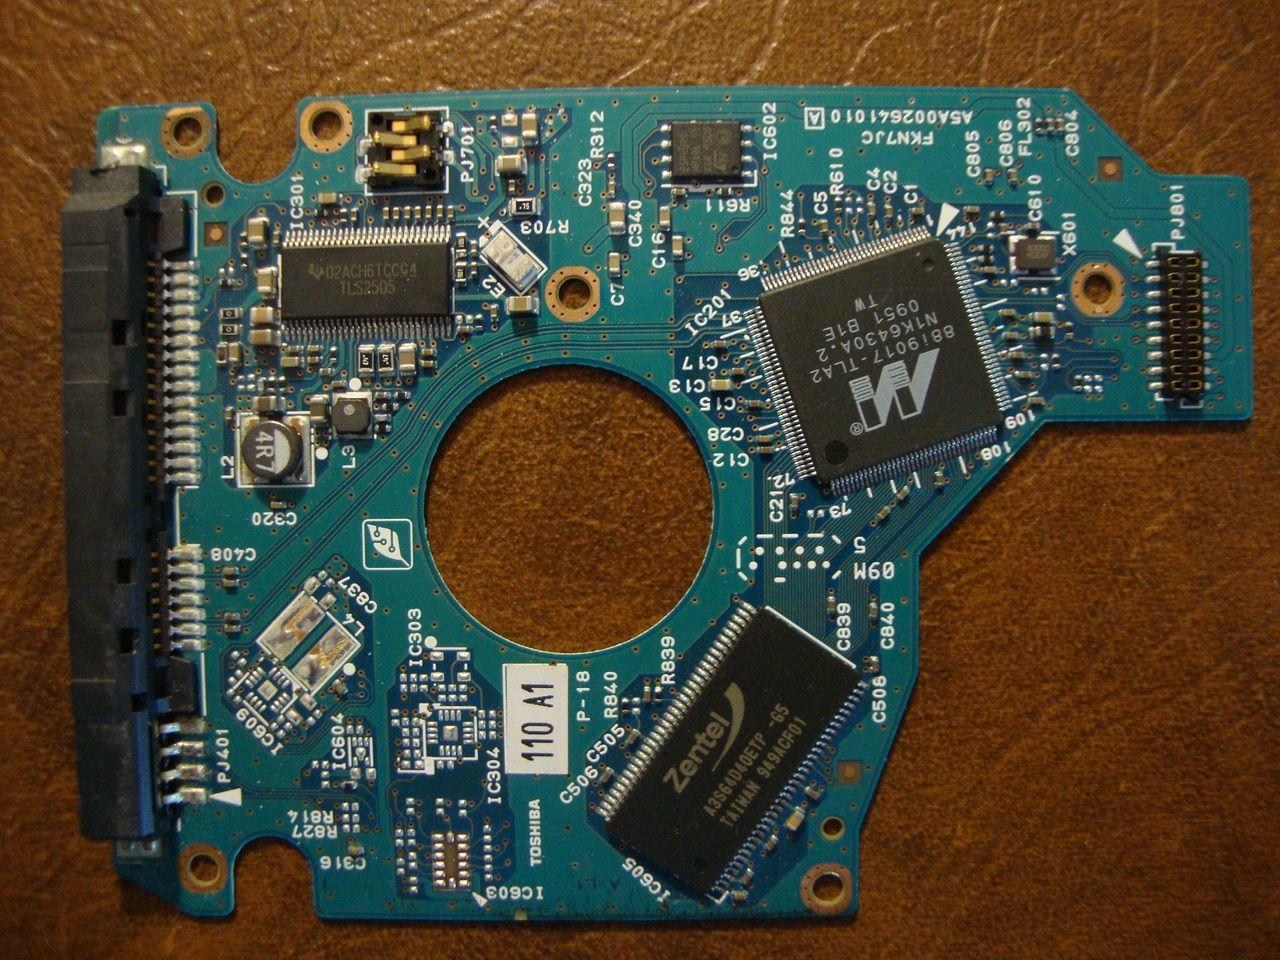 Toshiba MK6465GSXW (HDD2H81 W RL01 T) 010 A0/GJ003A G002641A 640gb Sata PCB - Effective Electronics #data recovery #hard drive repair #computer repair #hard drives #hard drive parts #toshiba